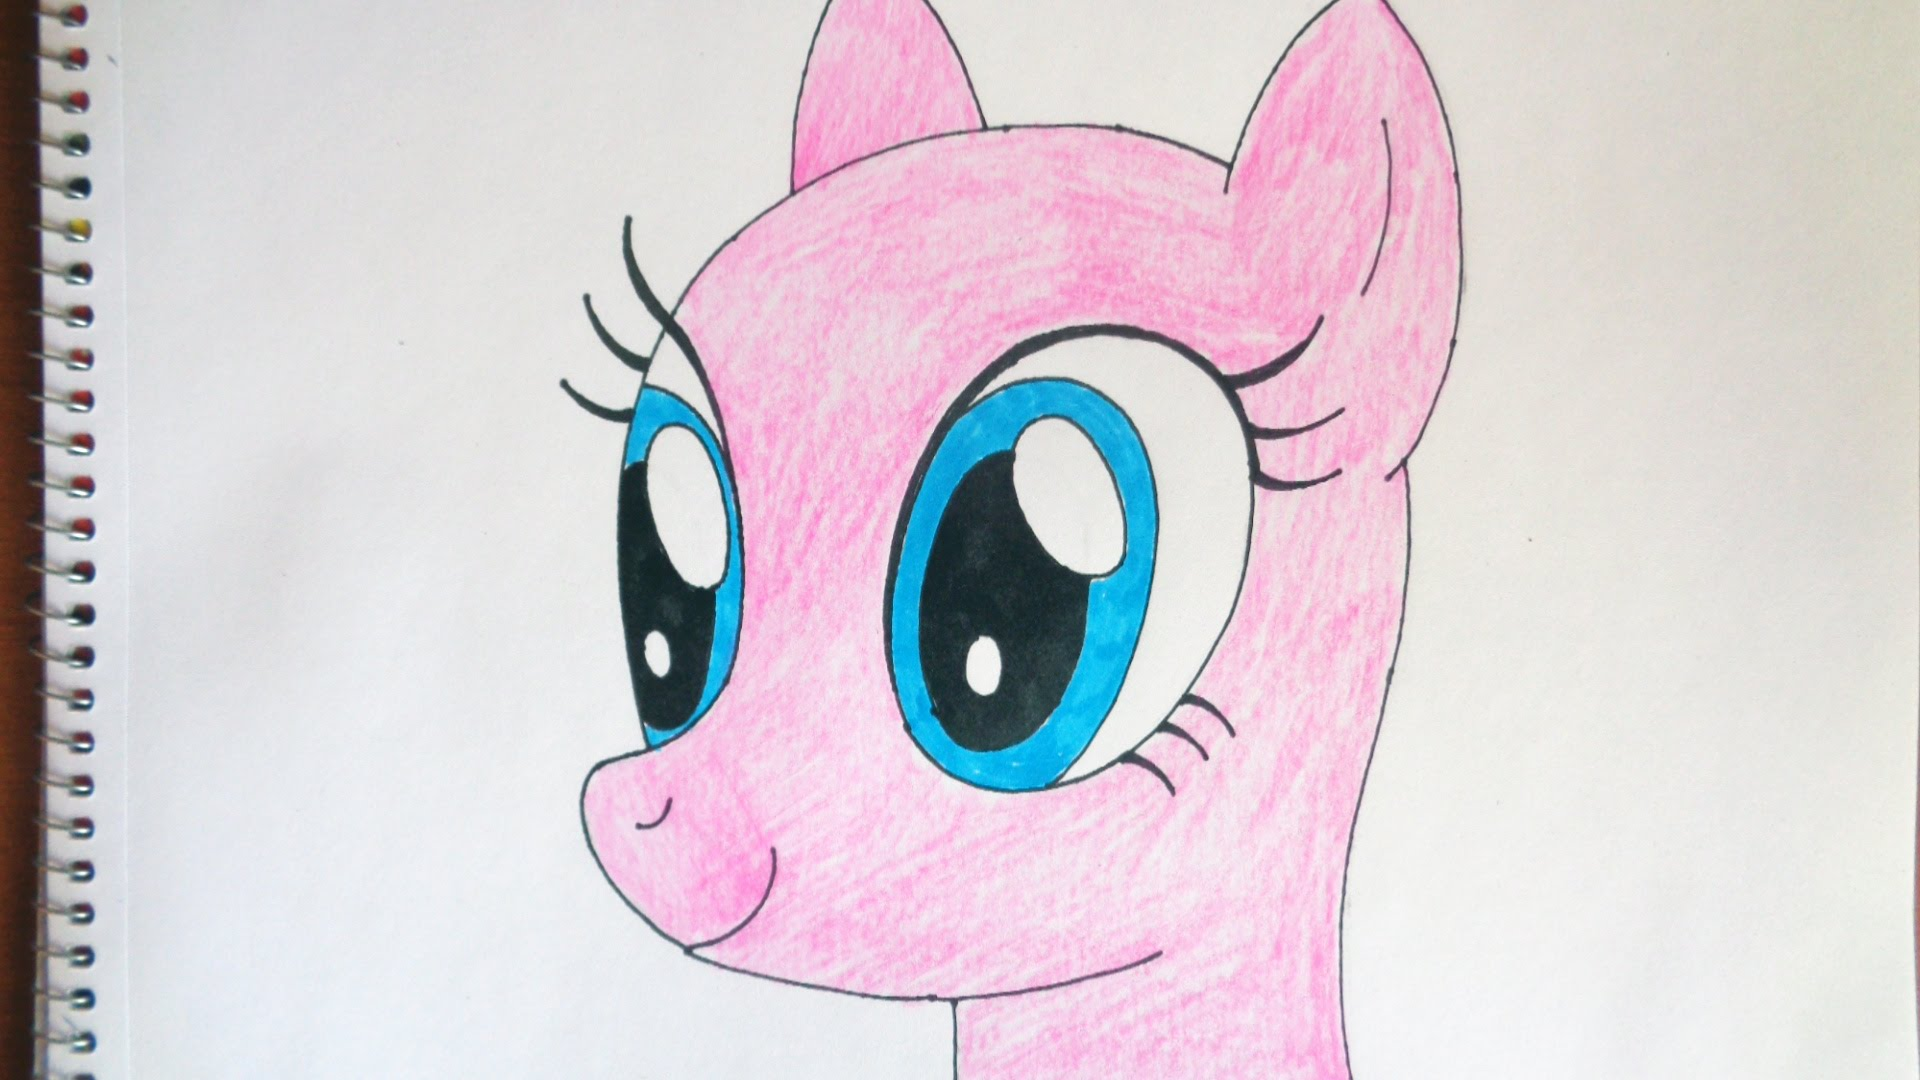 Drawn my little pony pony head My Как How Как рисовать